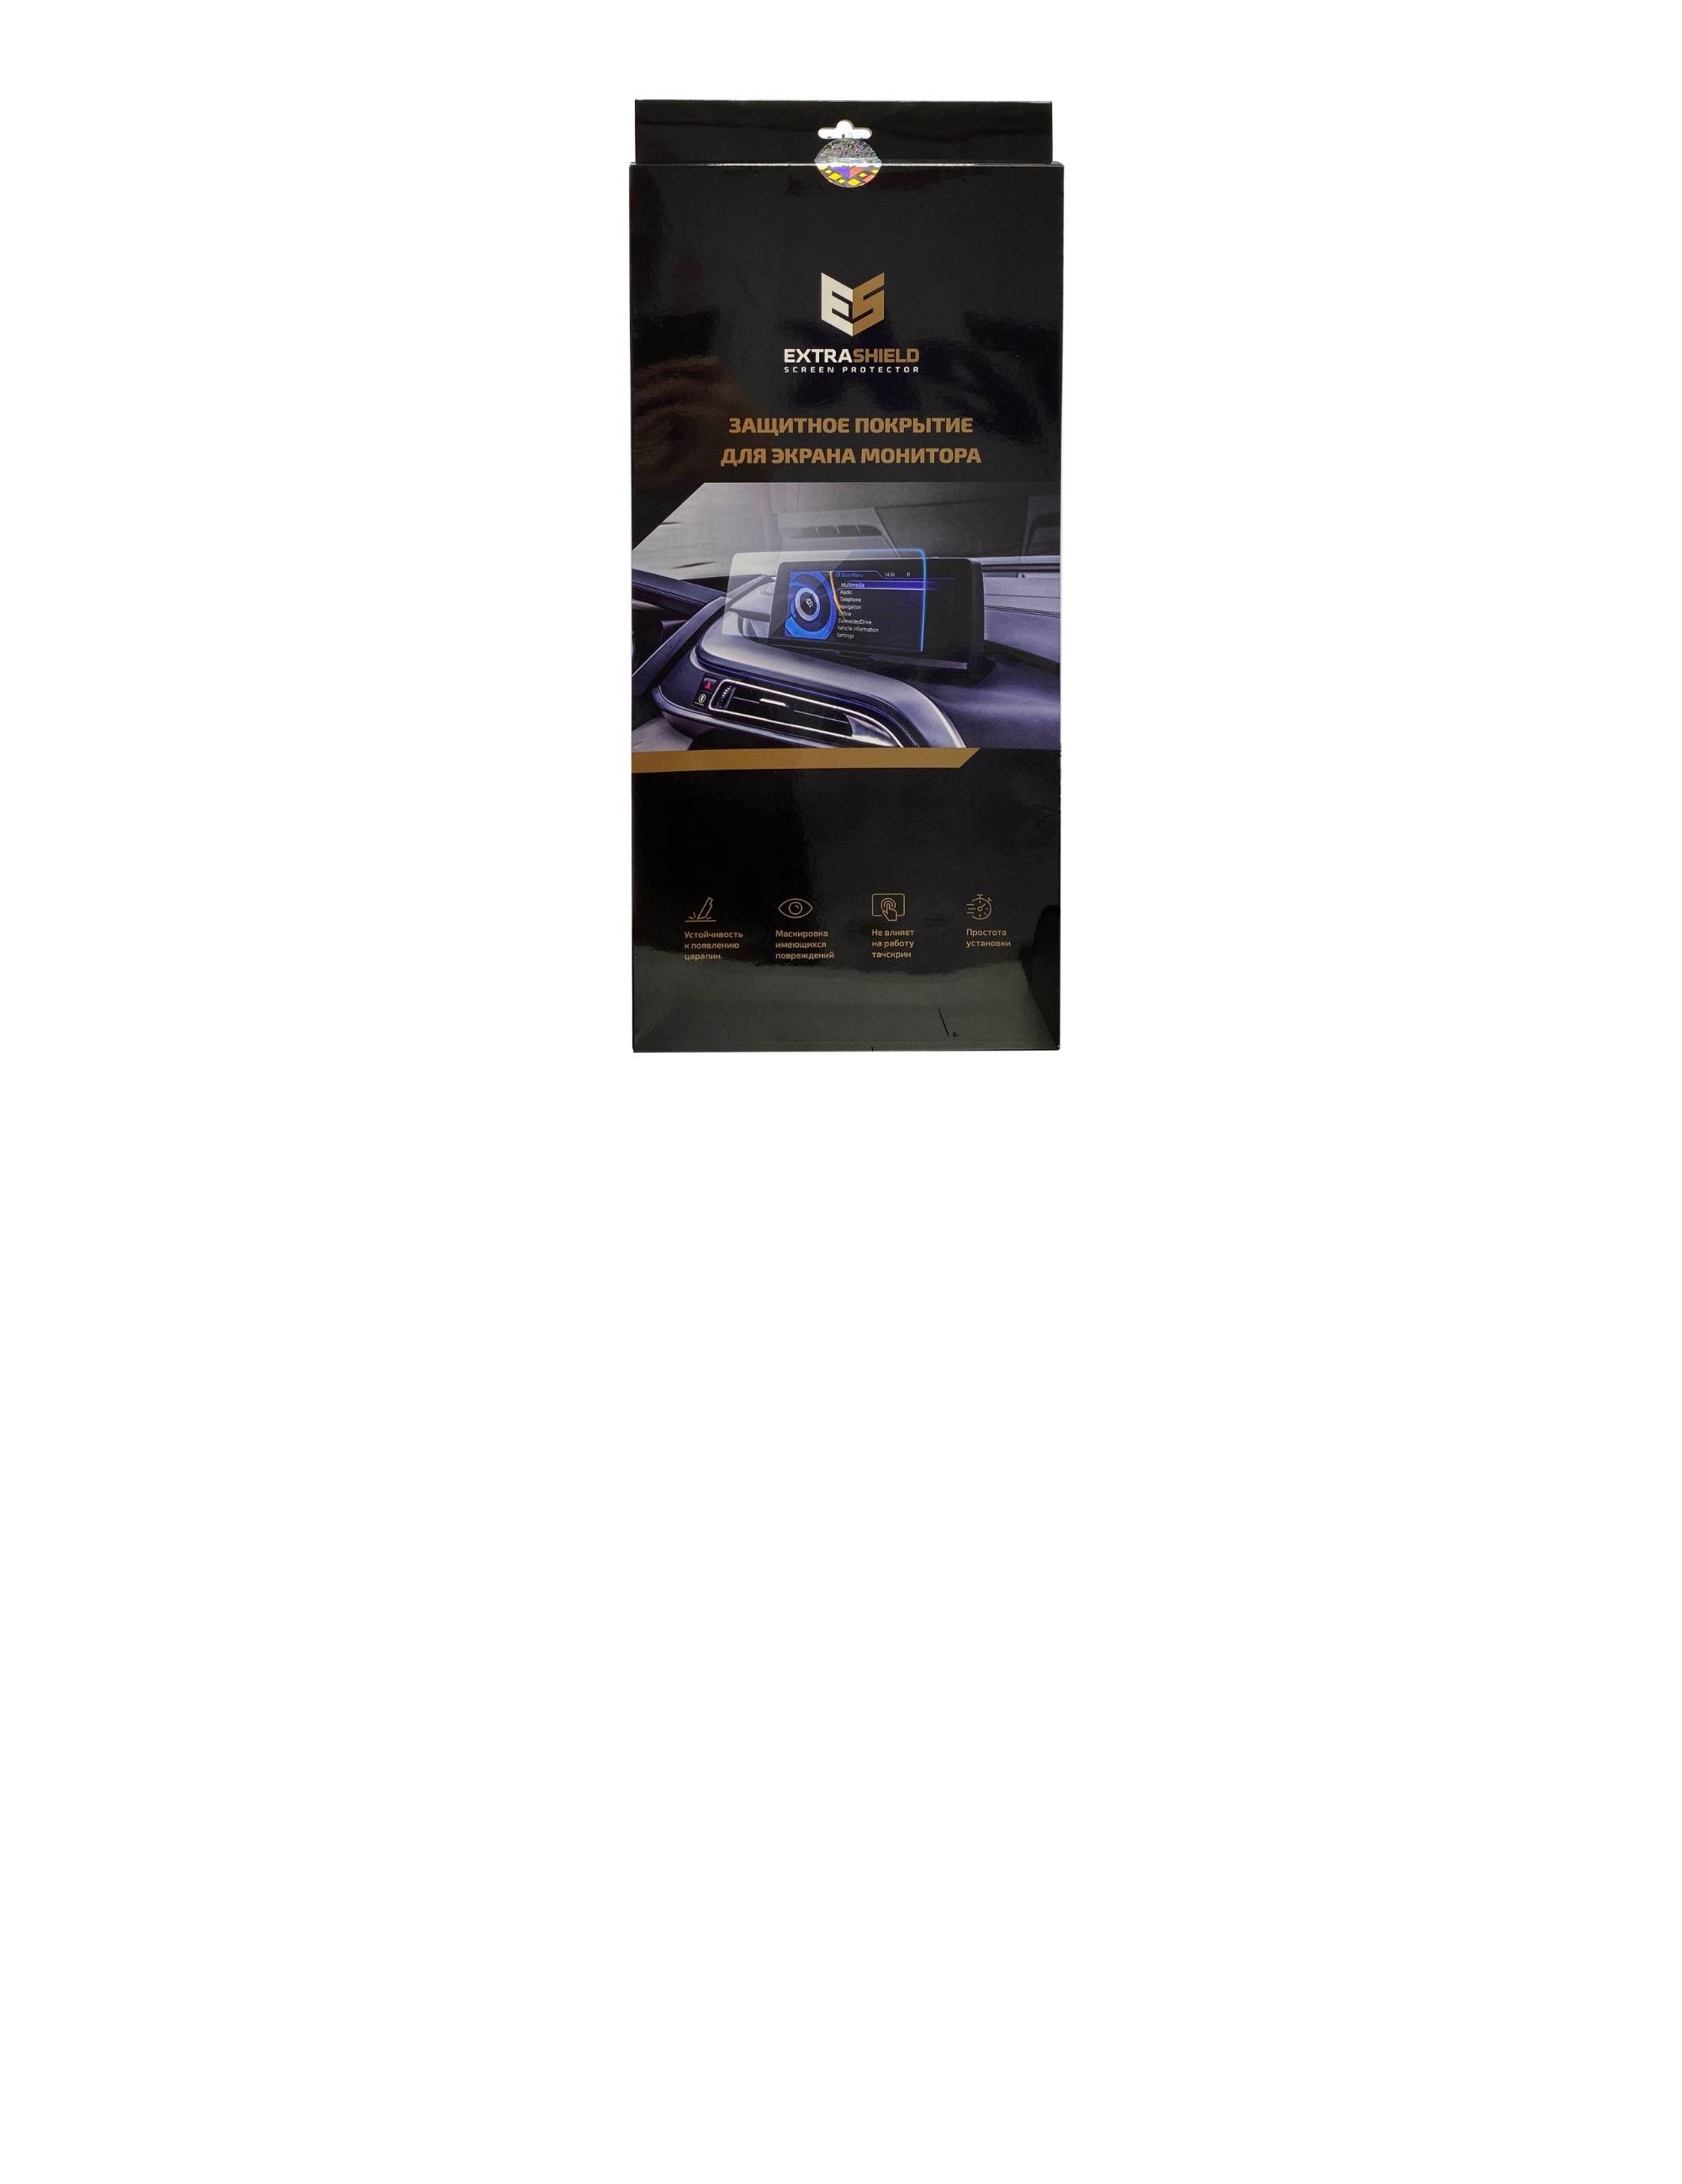 Porsche Macan 2018 - н.в. мультимедиа 8 Защитное стекло Матовая